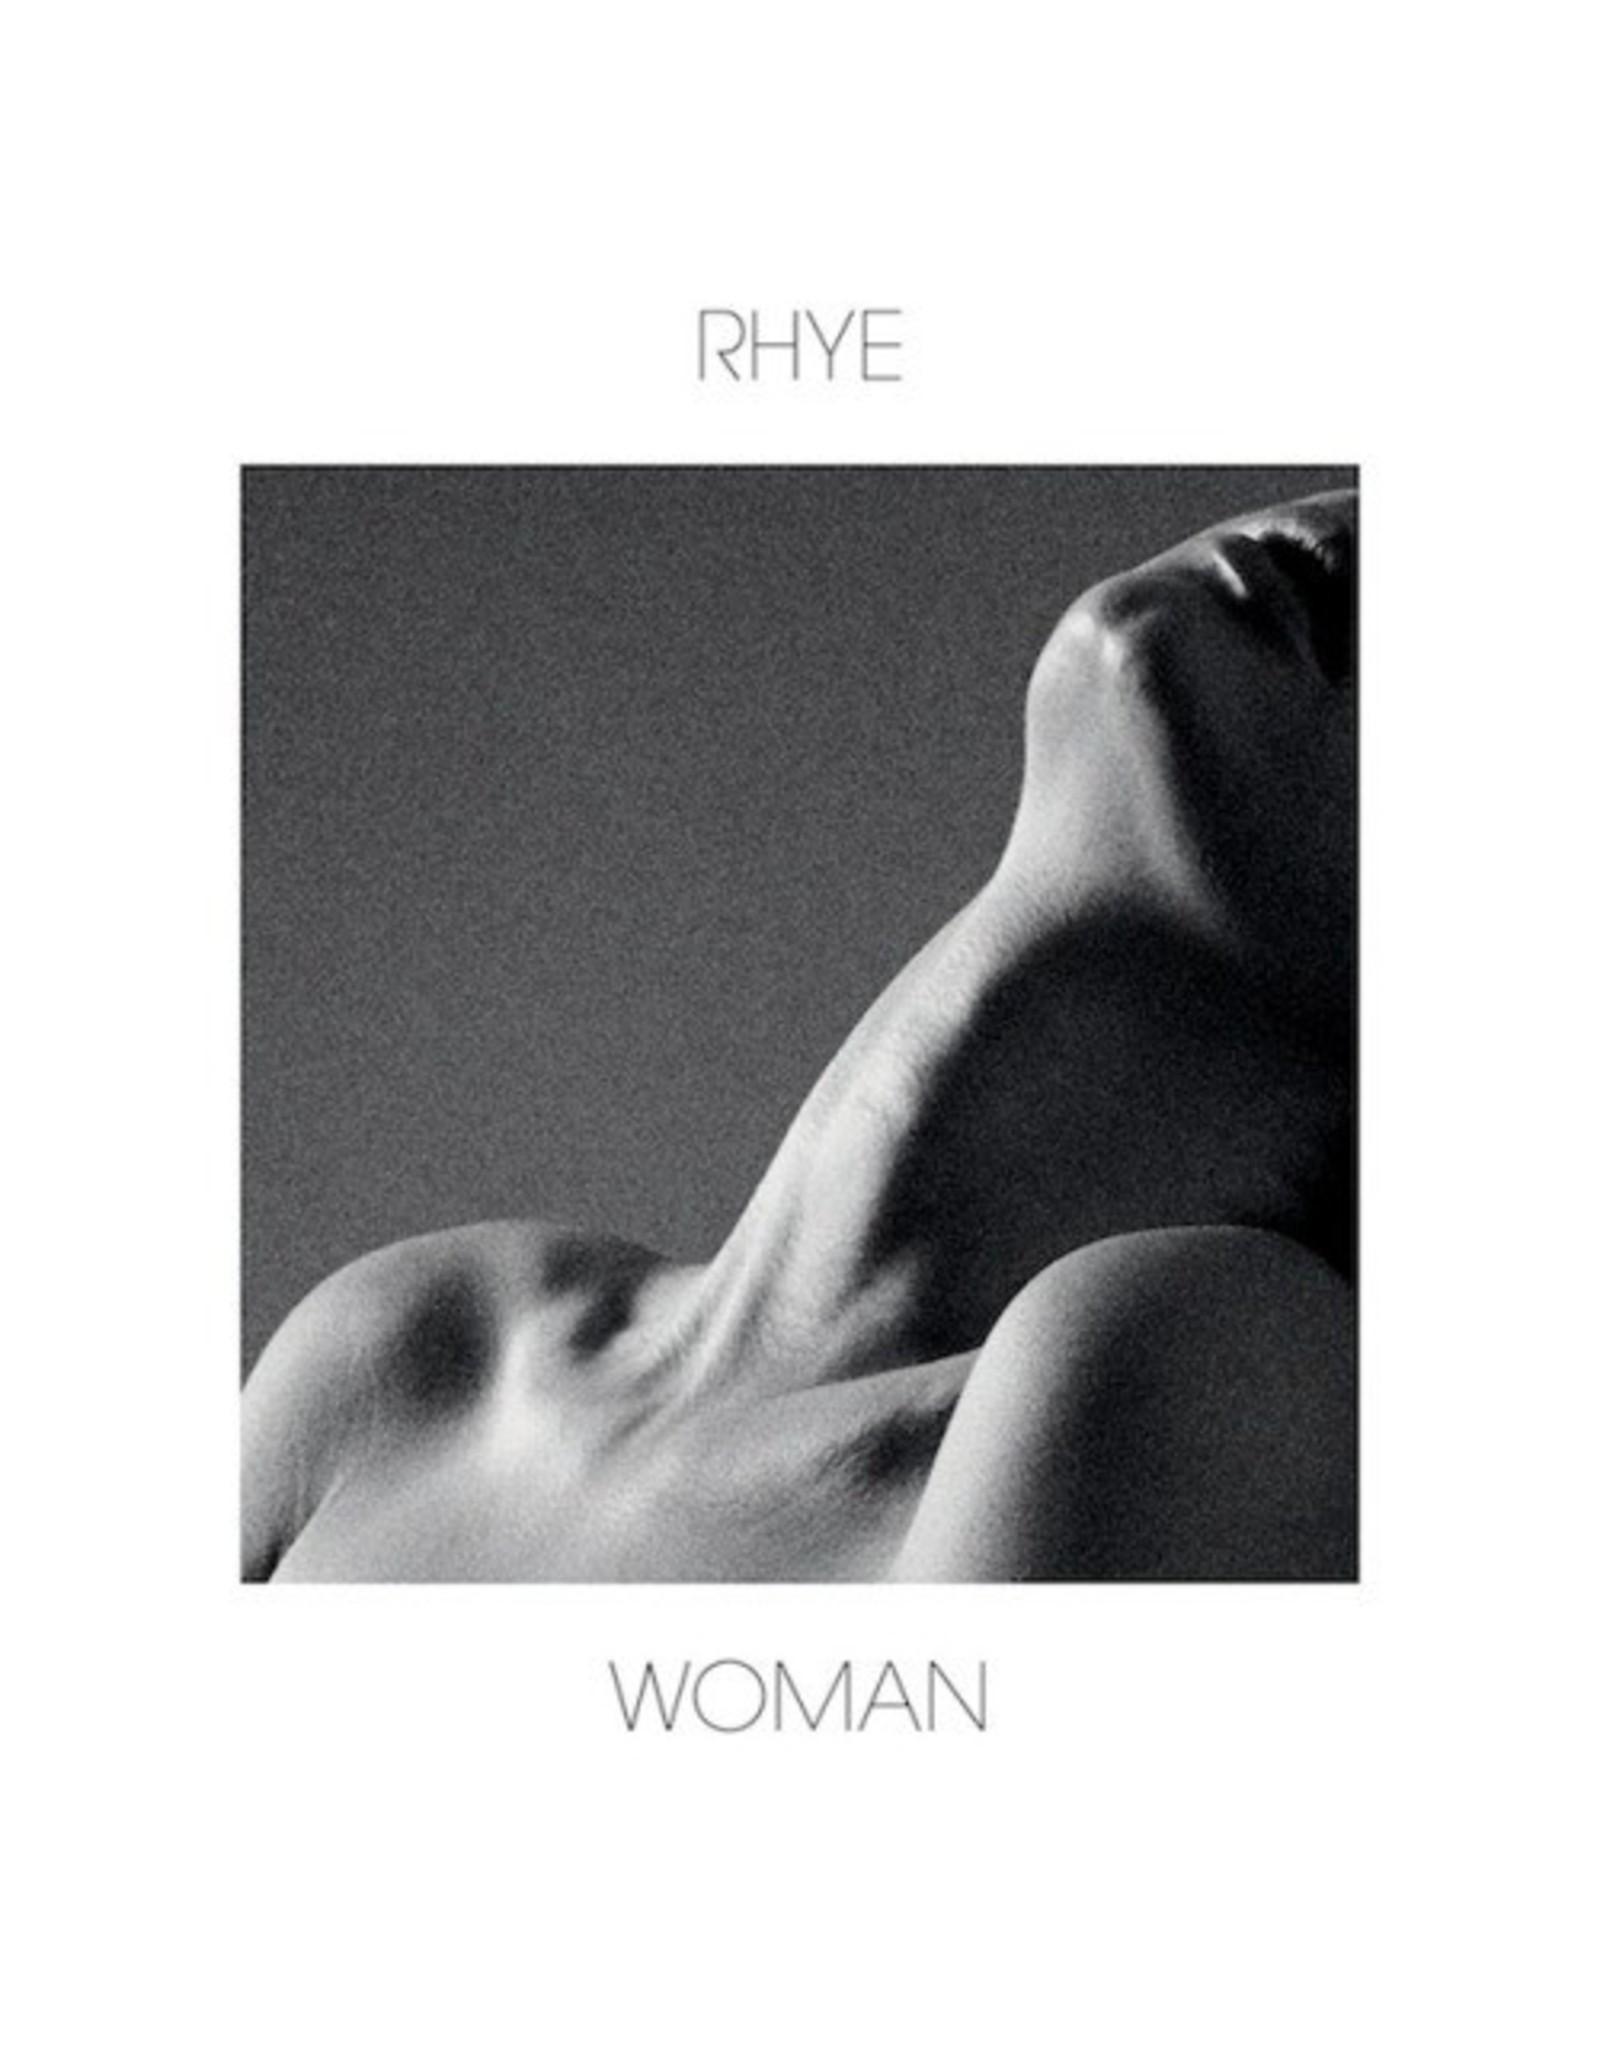 New Vinyl Rhye - Woman LP